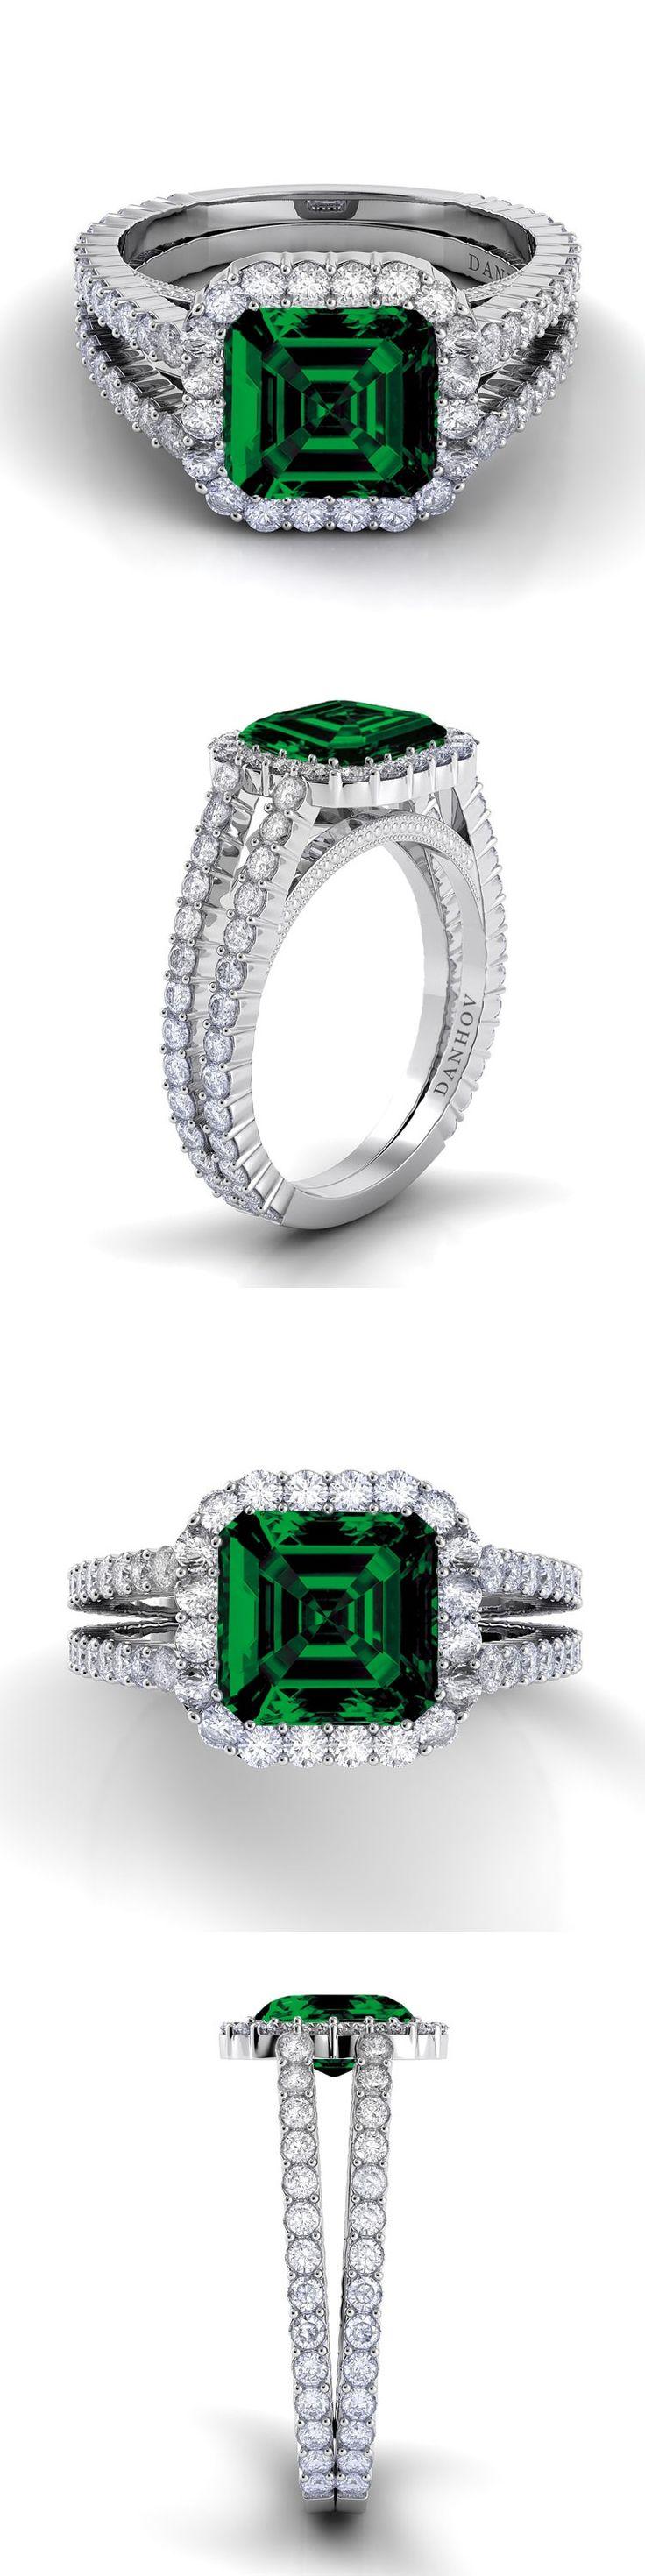 93 best Gemstone Engagement Rings images on Pinterest